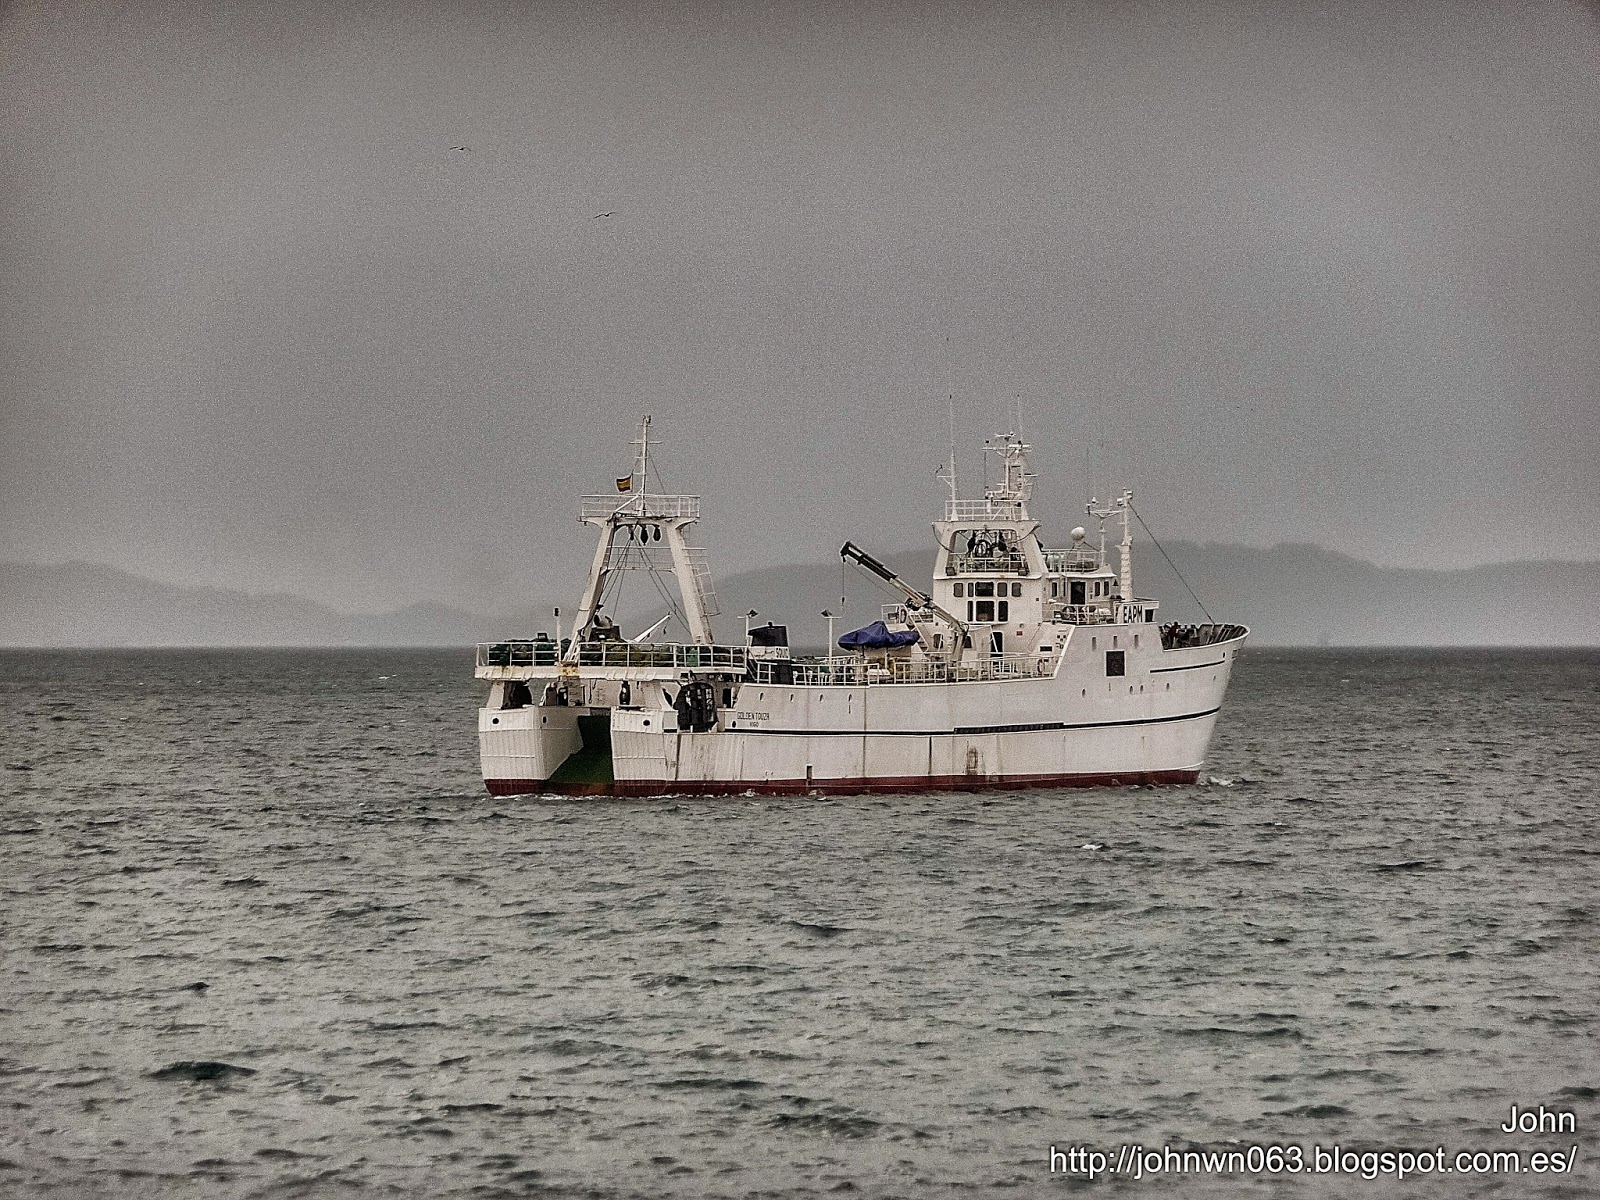 fotos de barcos, imagenes de barcos, golden touza, hermanos touza, arrastrero, vigo